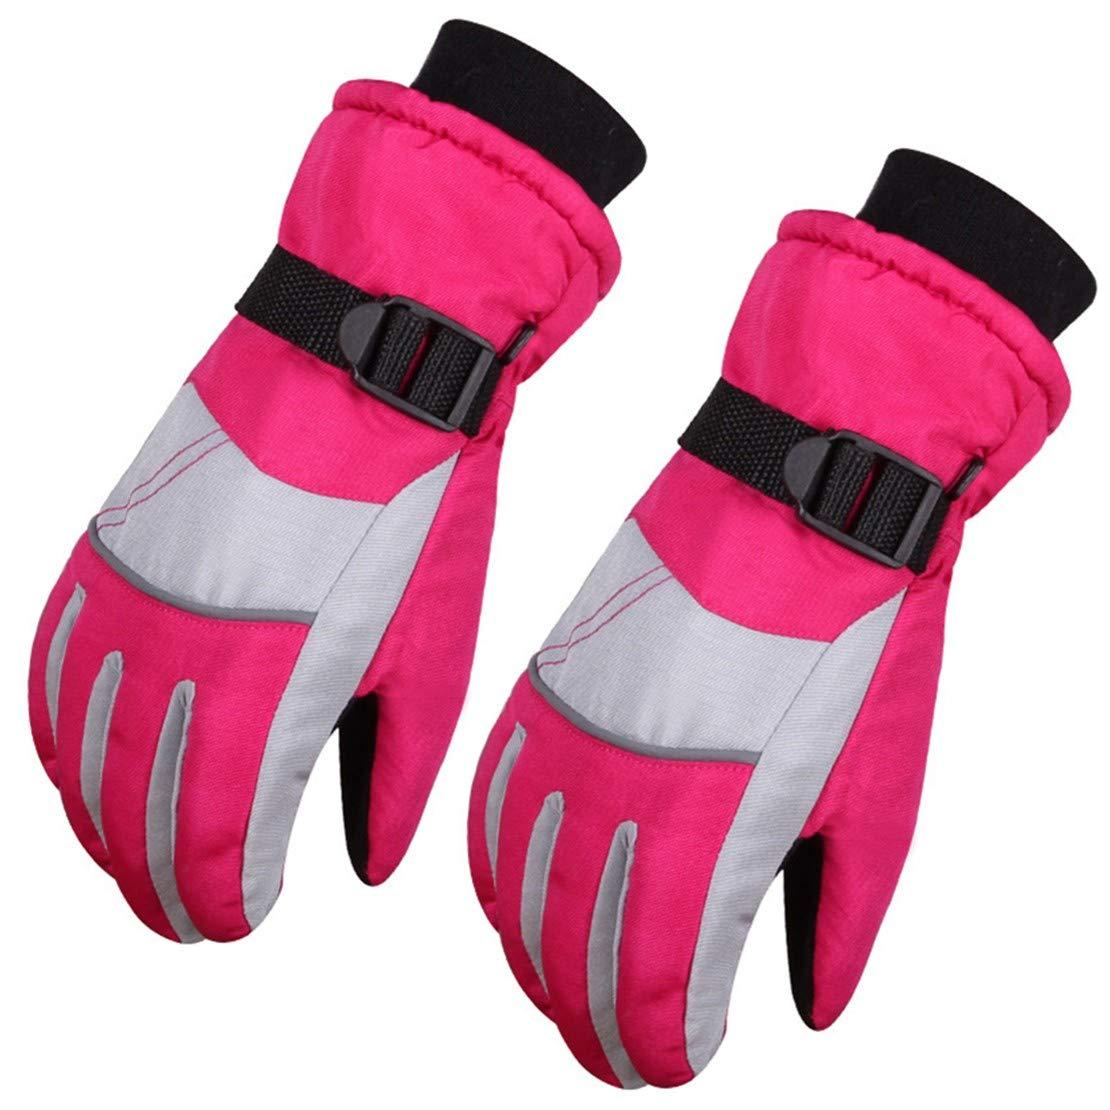 FamyFirst 1 Pair Ski Gloves Waterproof Windproof Glove for Winter Outdoor Sport